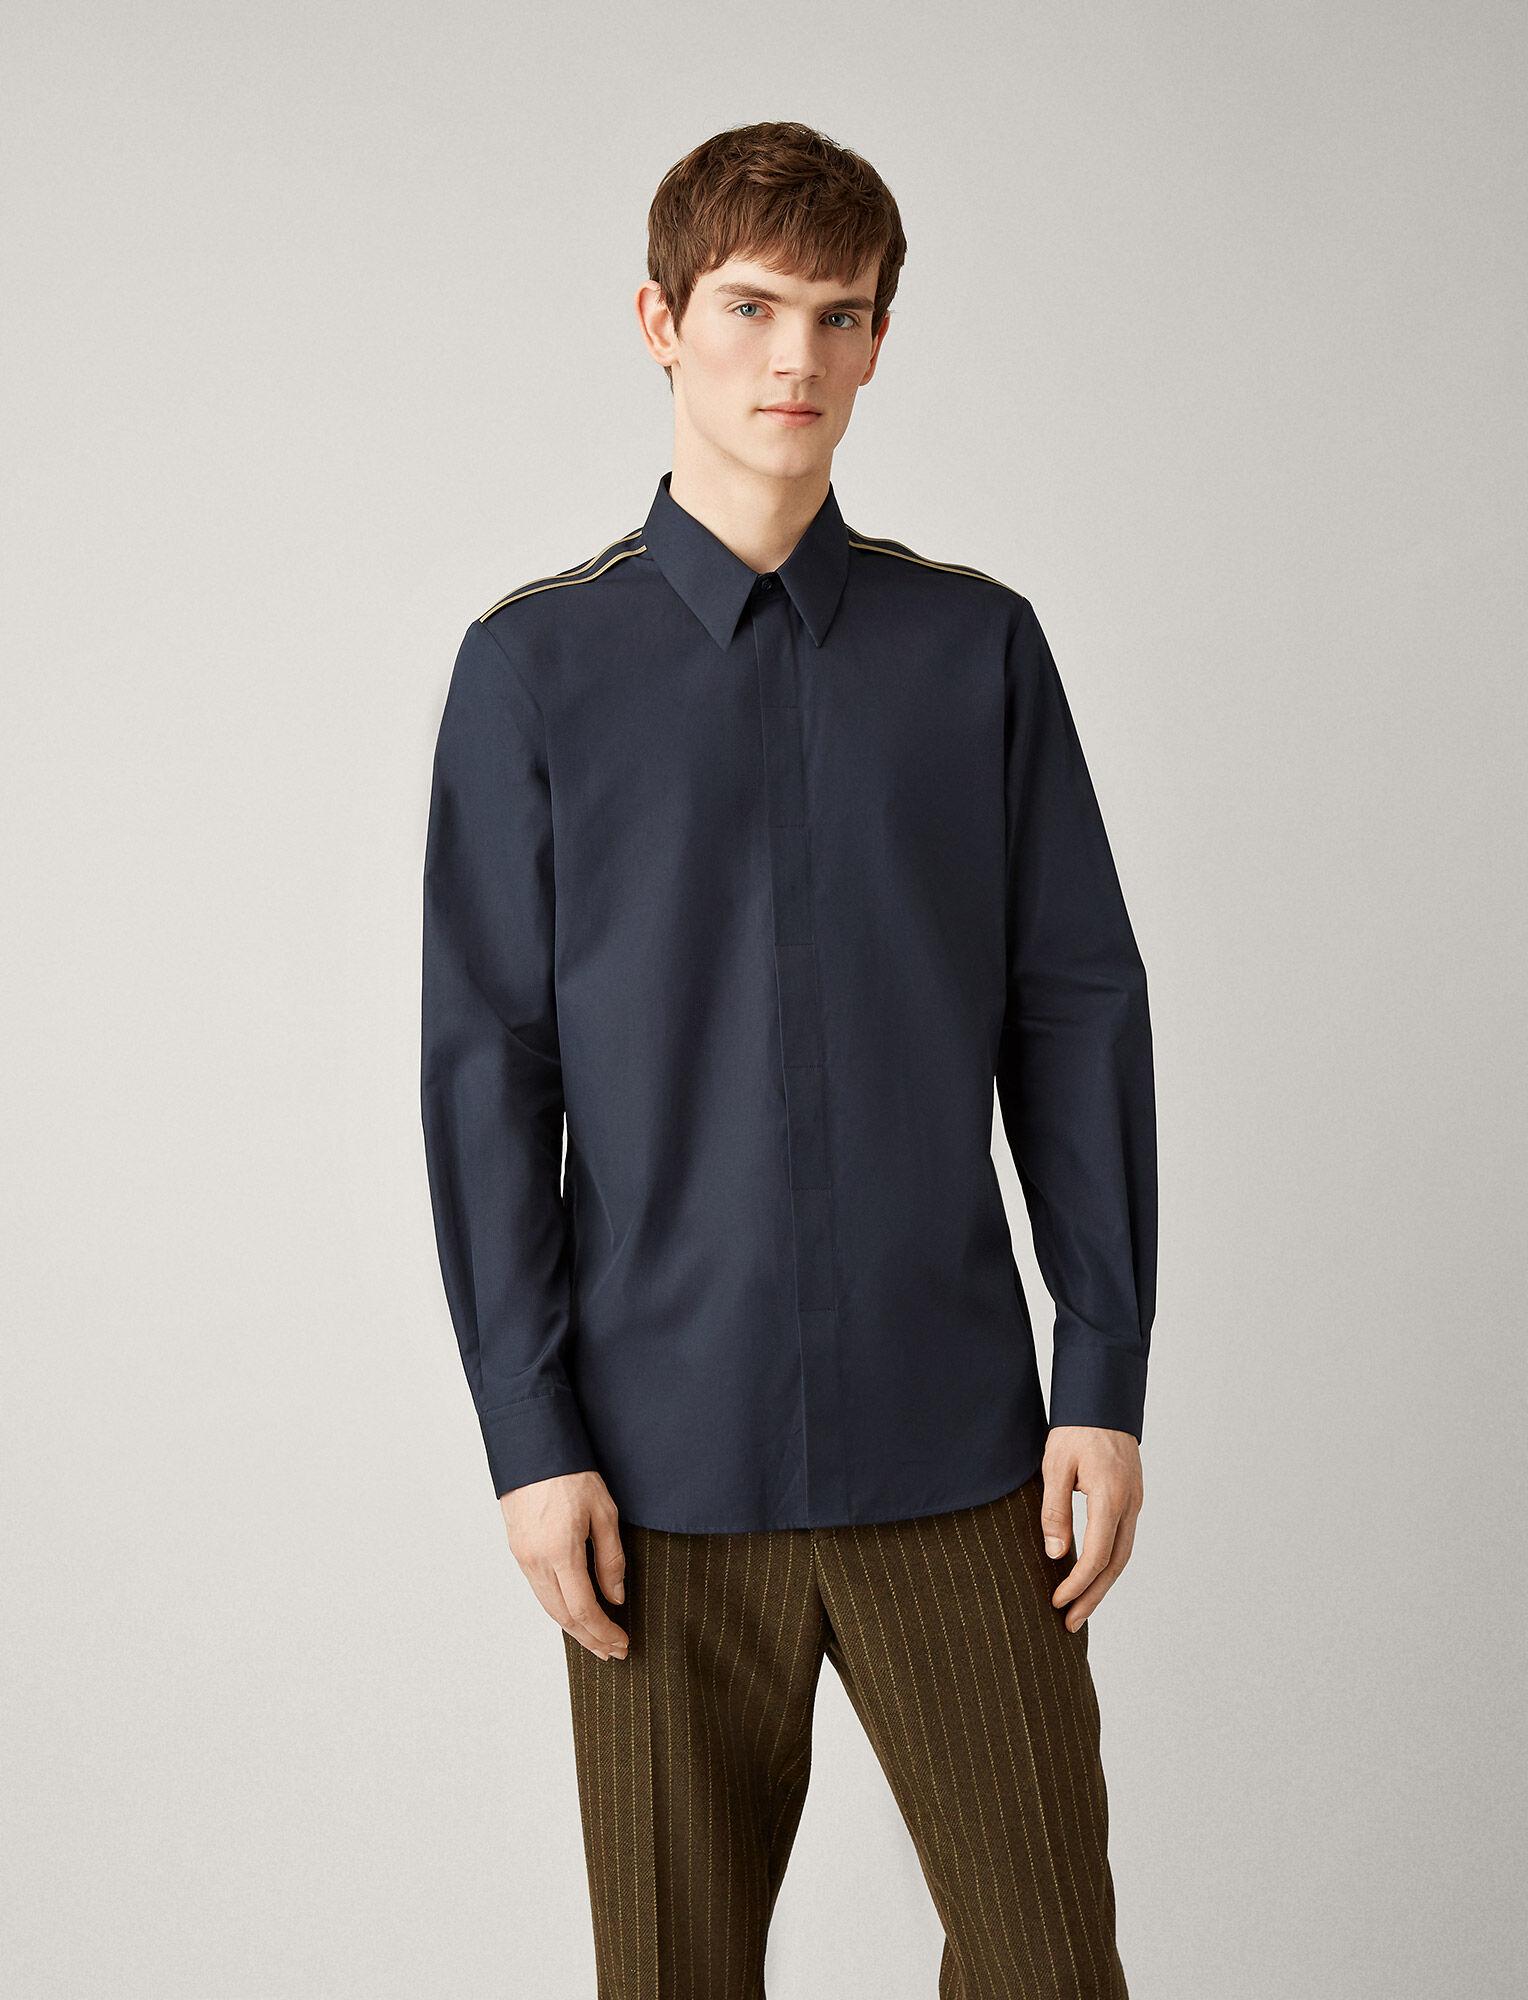 Joseph, James Poplin Shirt, in NAVY